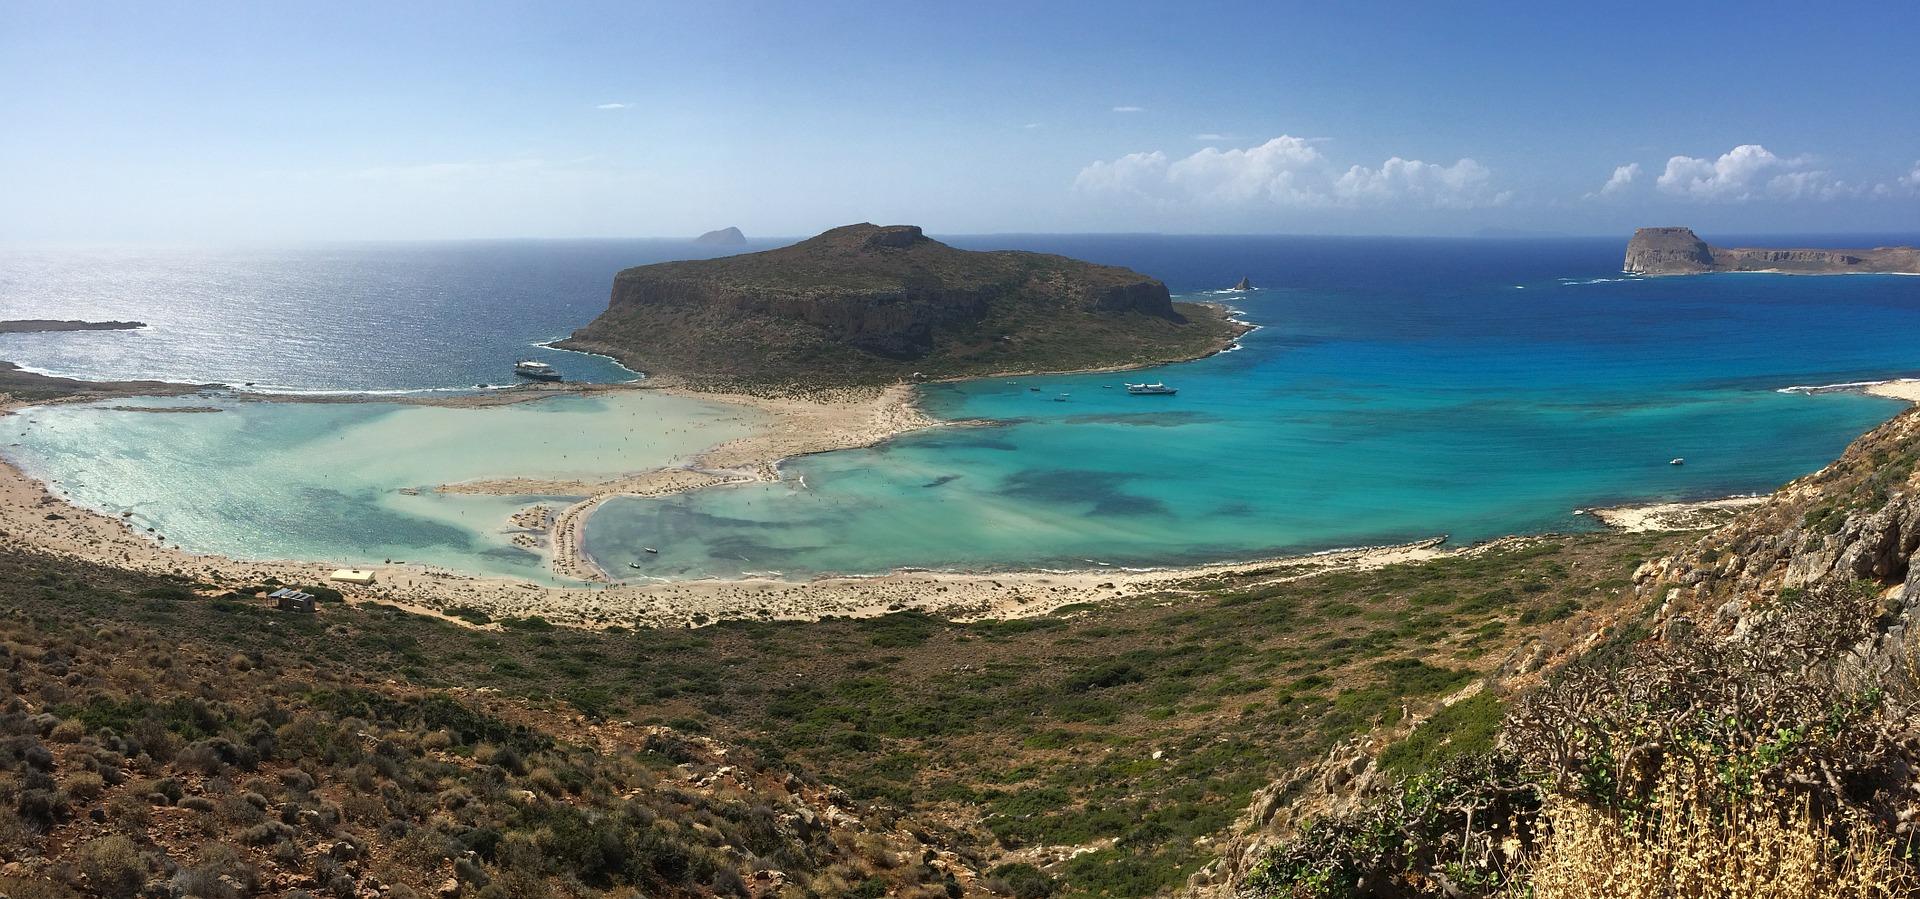 Destination Crete!